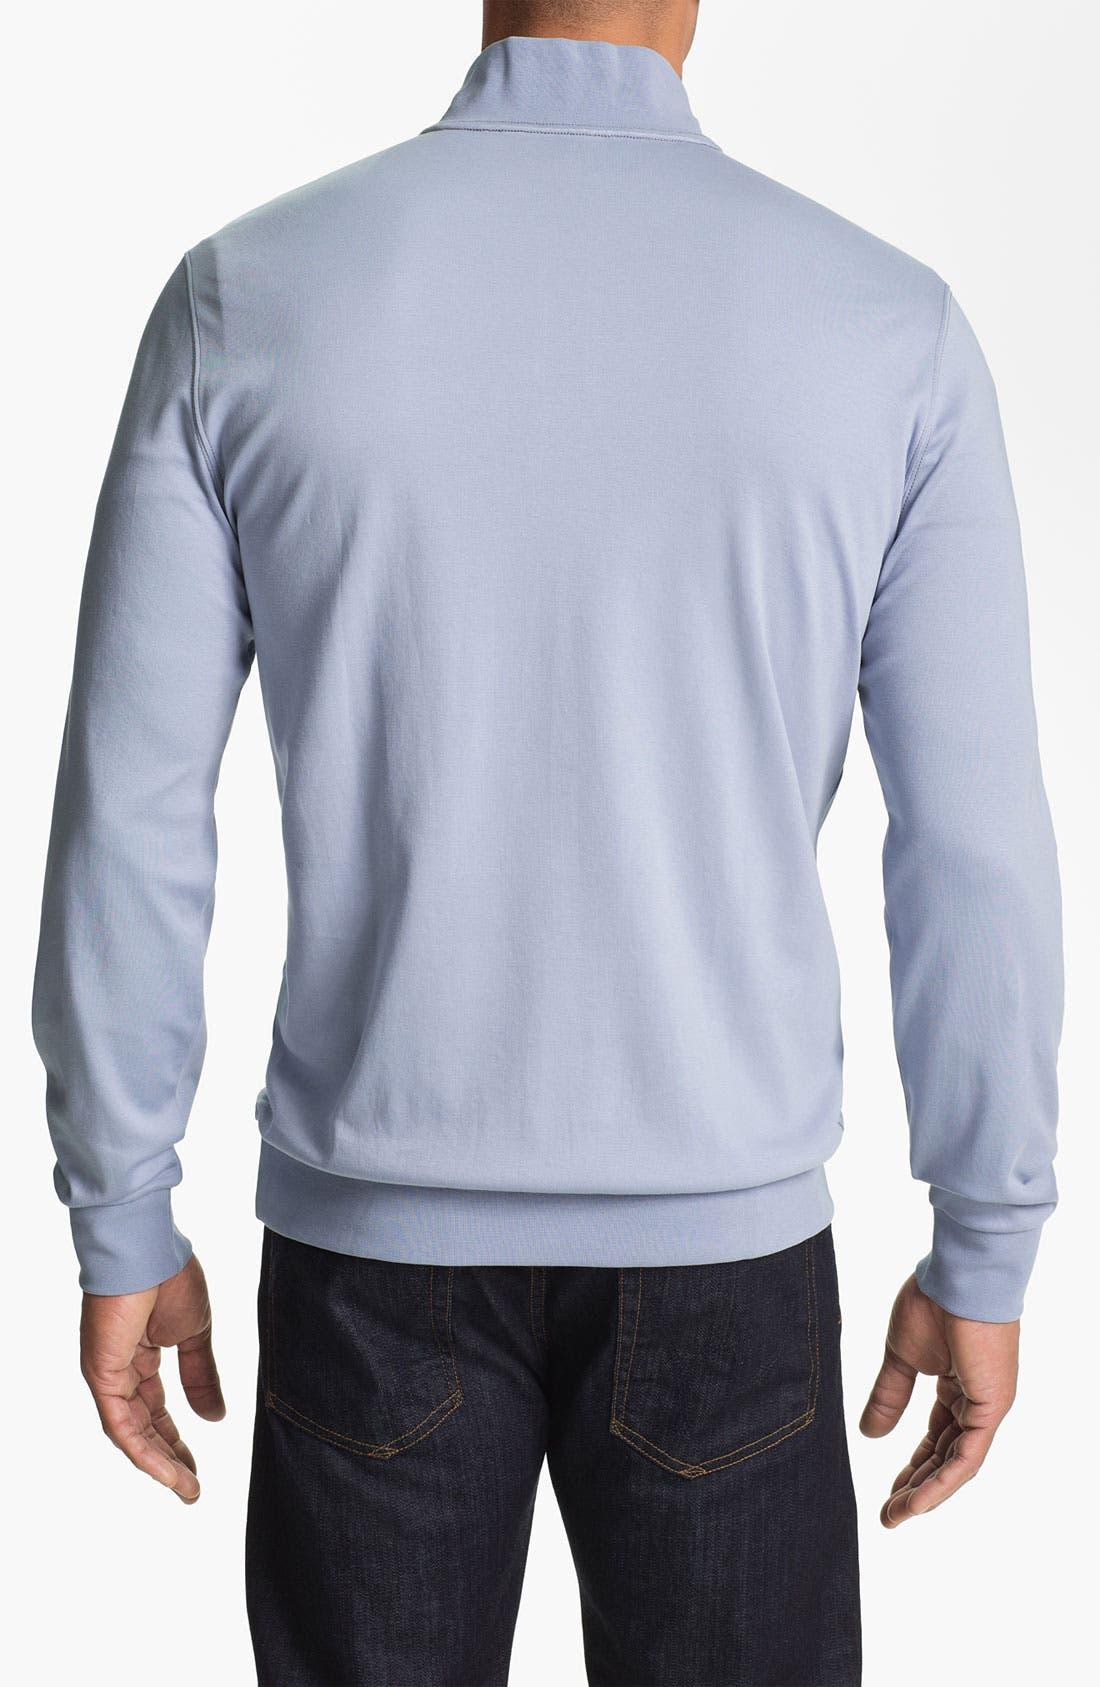 Alternate Image 2  - Robert Barakett 'Georgia' Half Zip Sweater